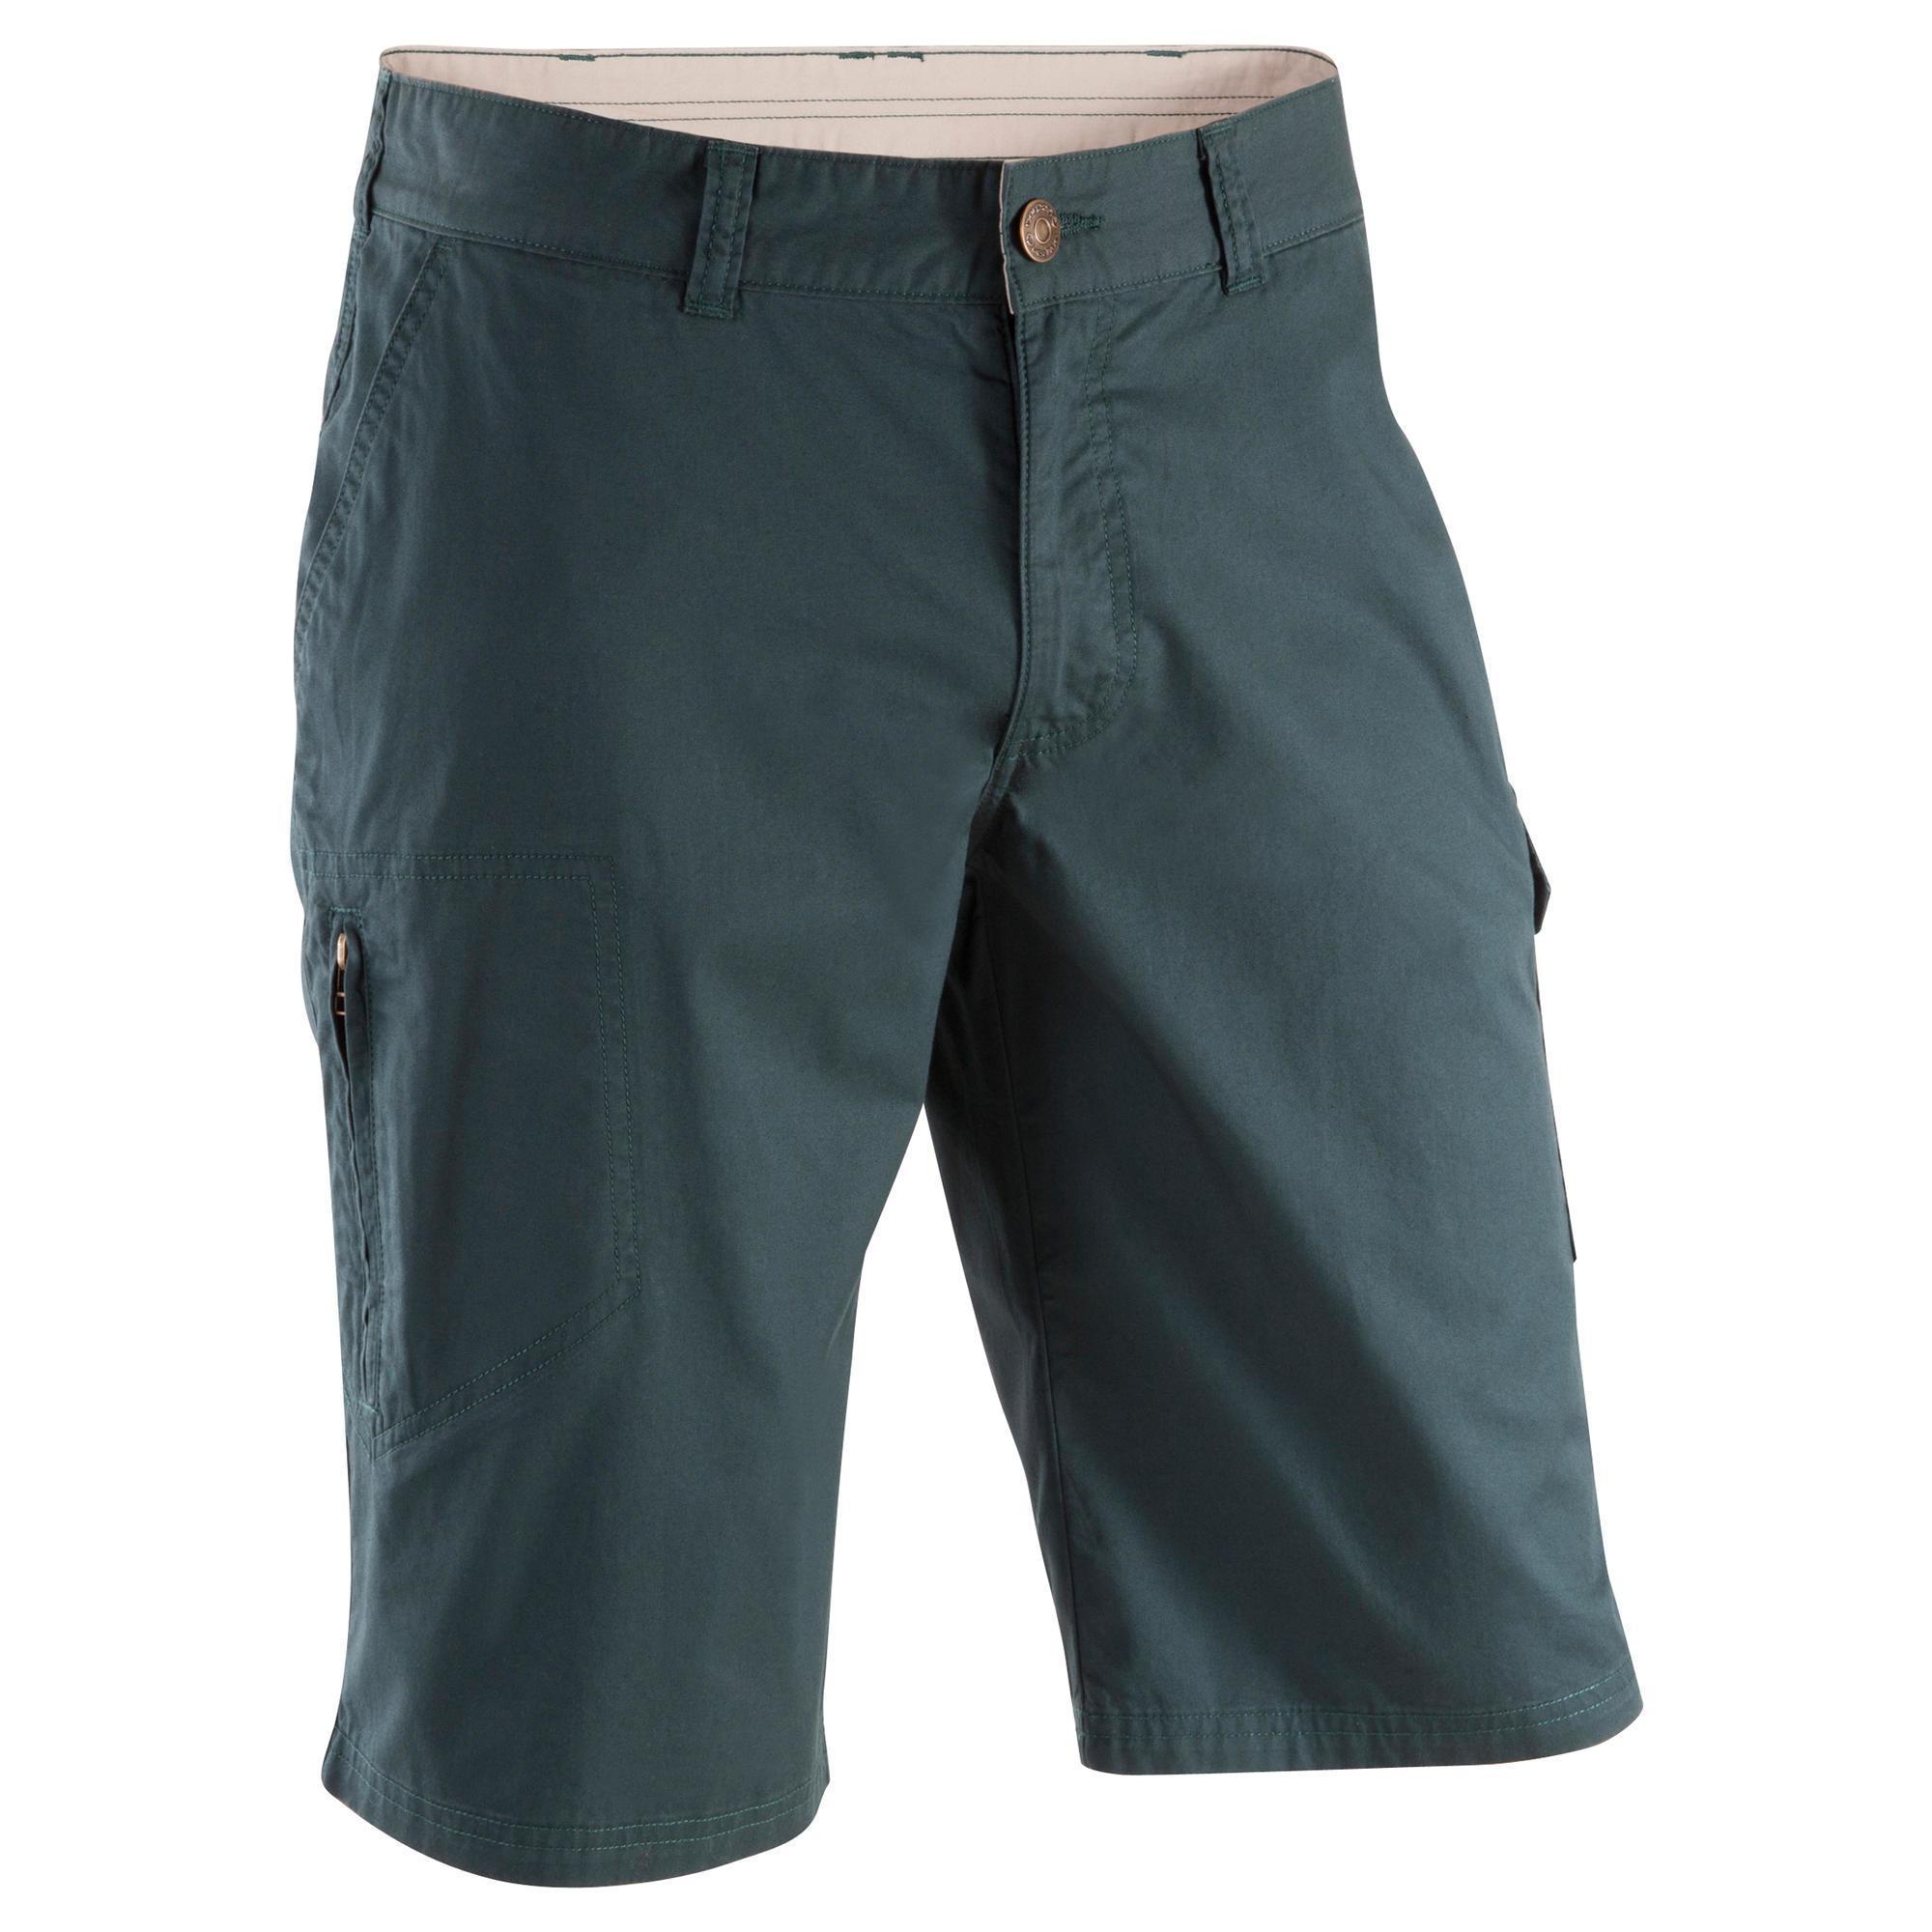 Pantalon - Bermudas Oui Londres LfXErTAICw